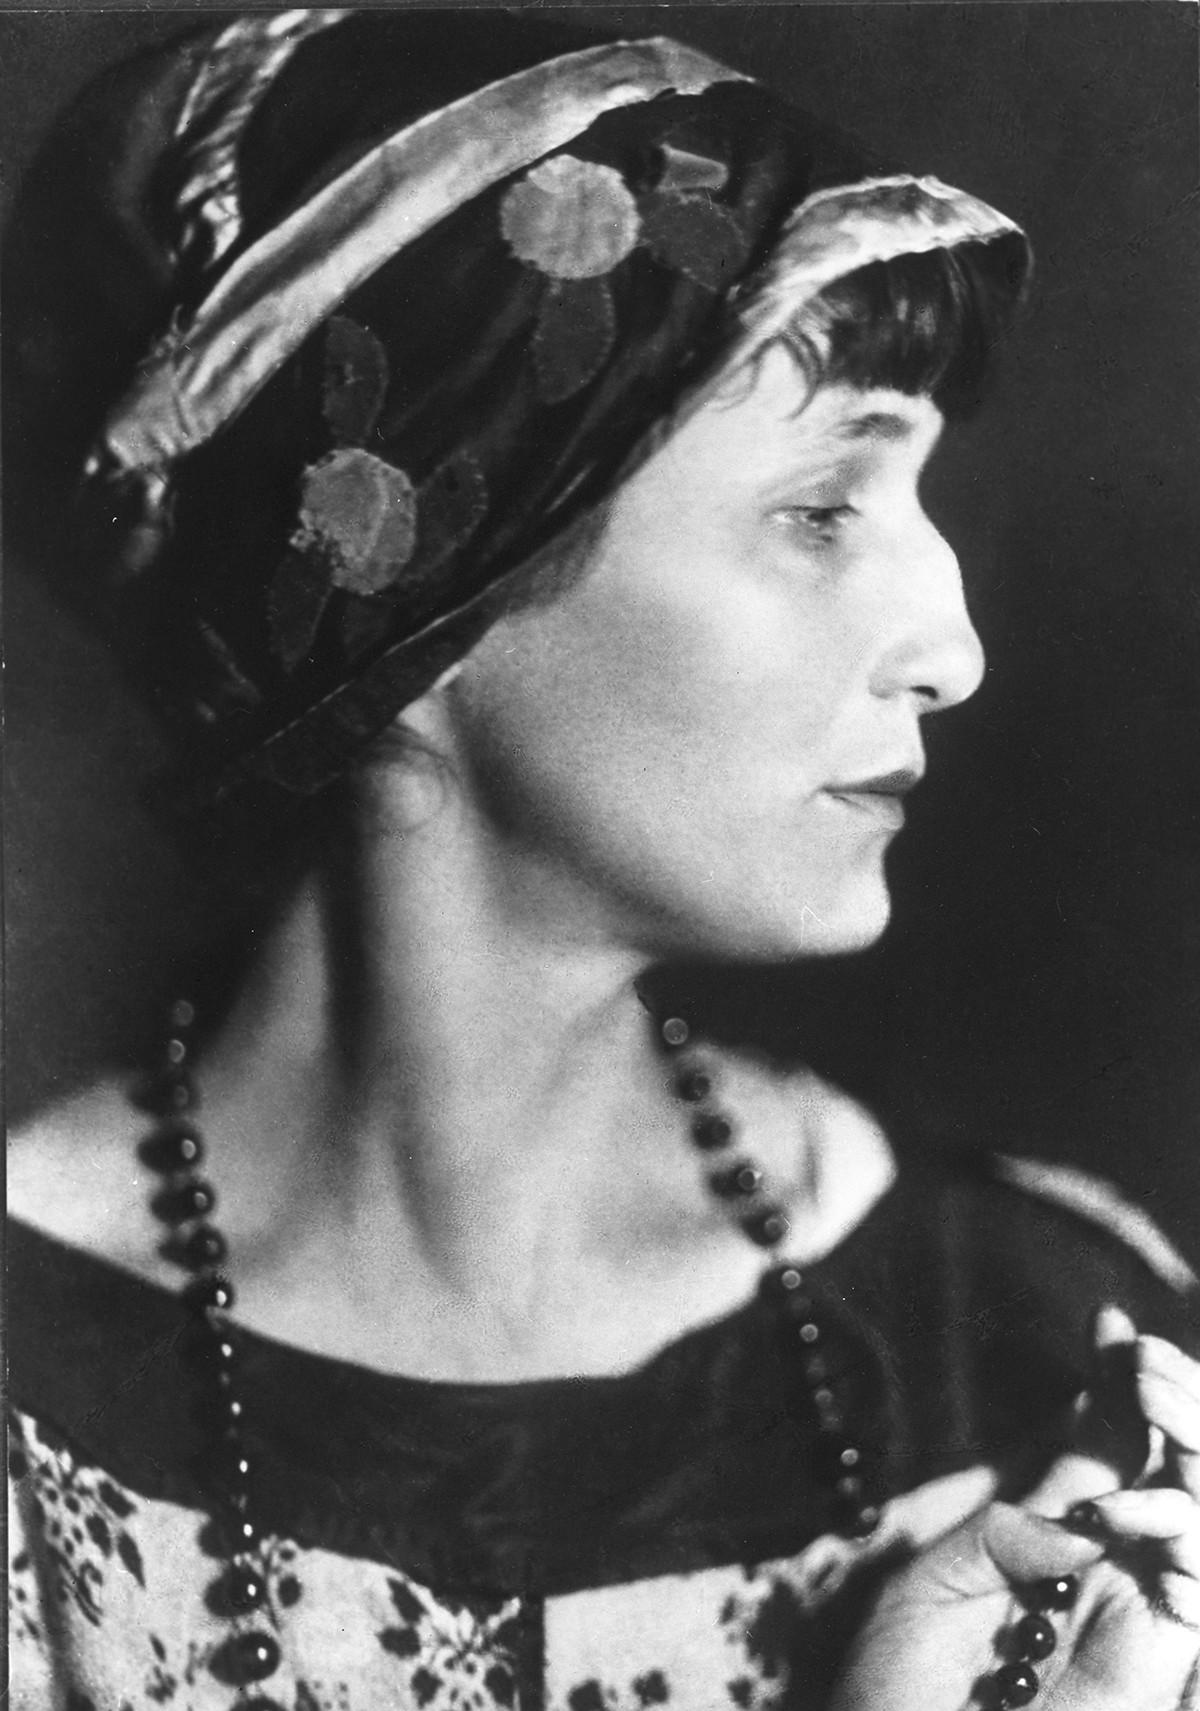 Anna Achmatowa, 1922